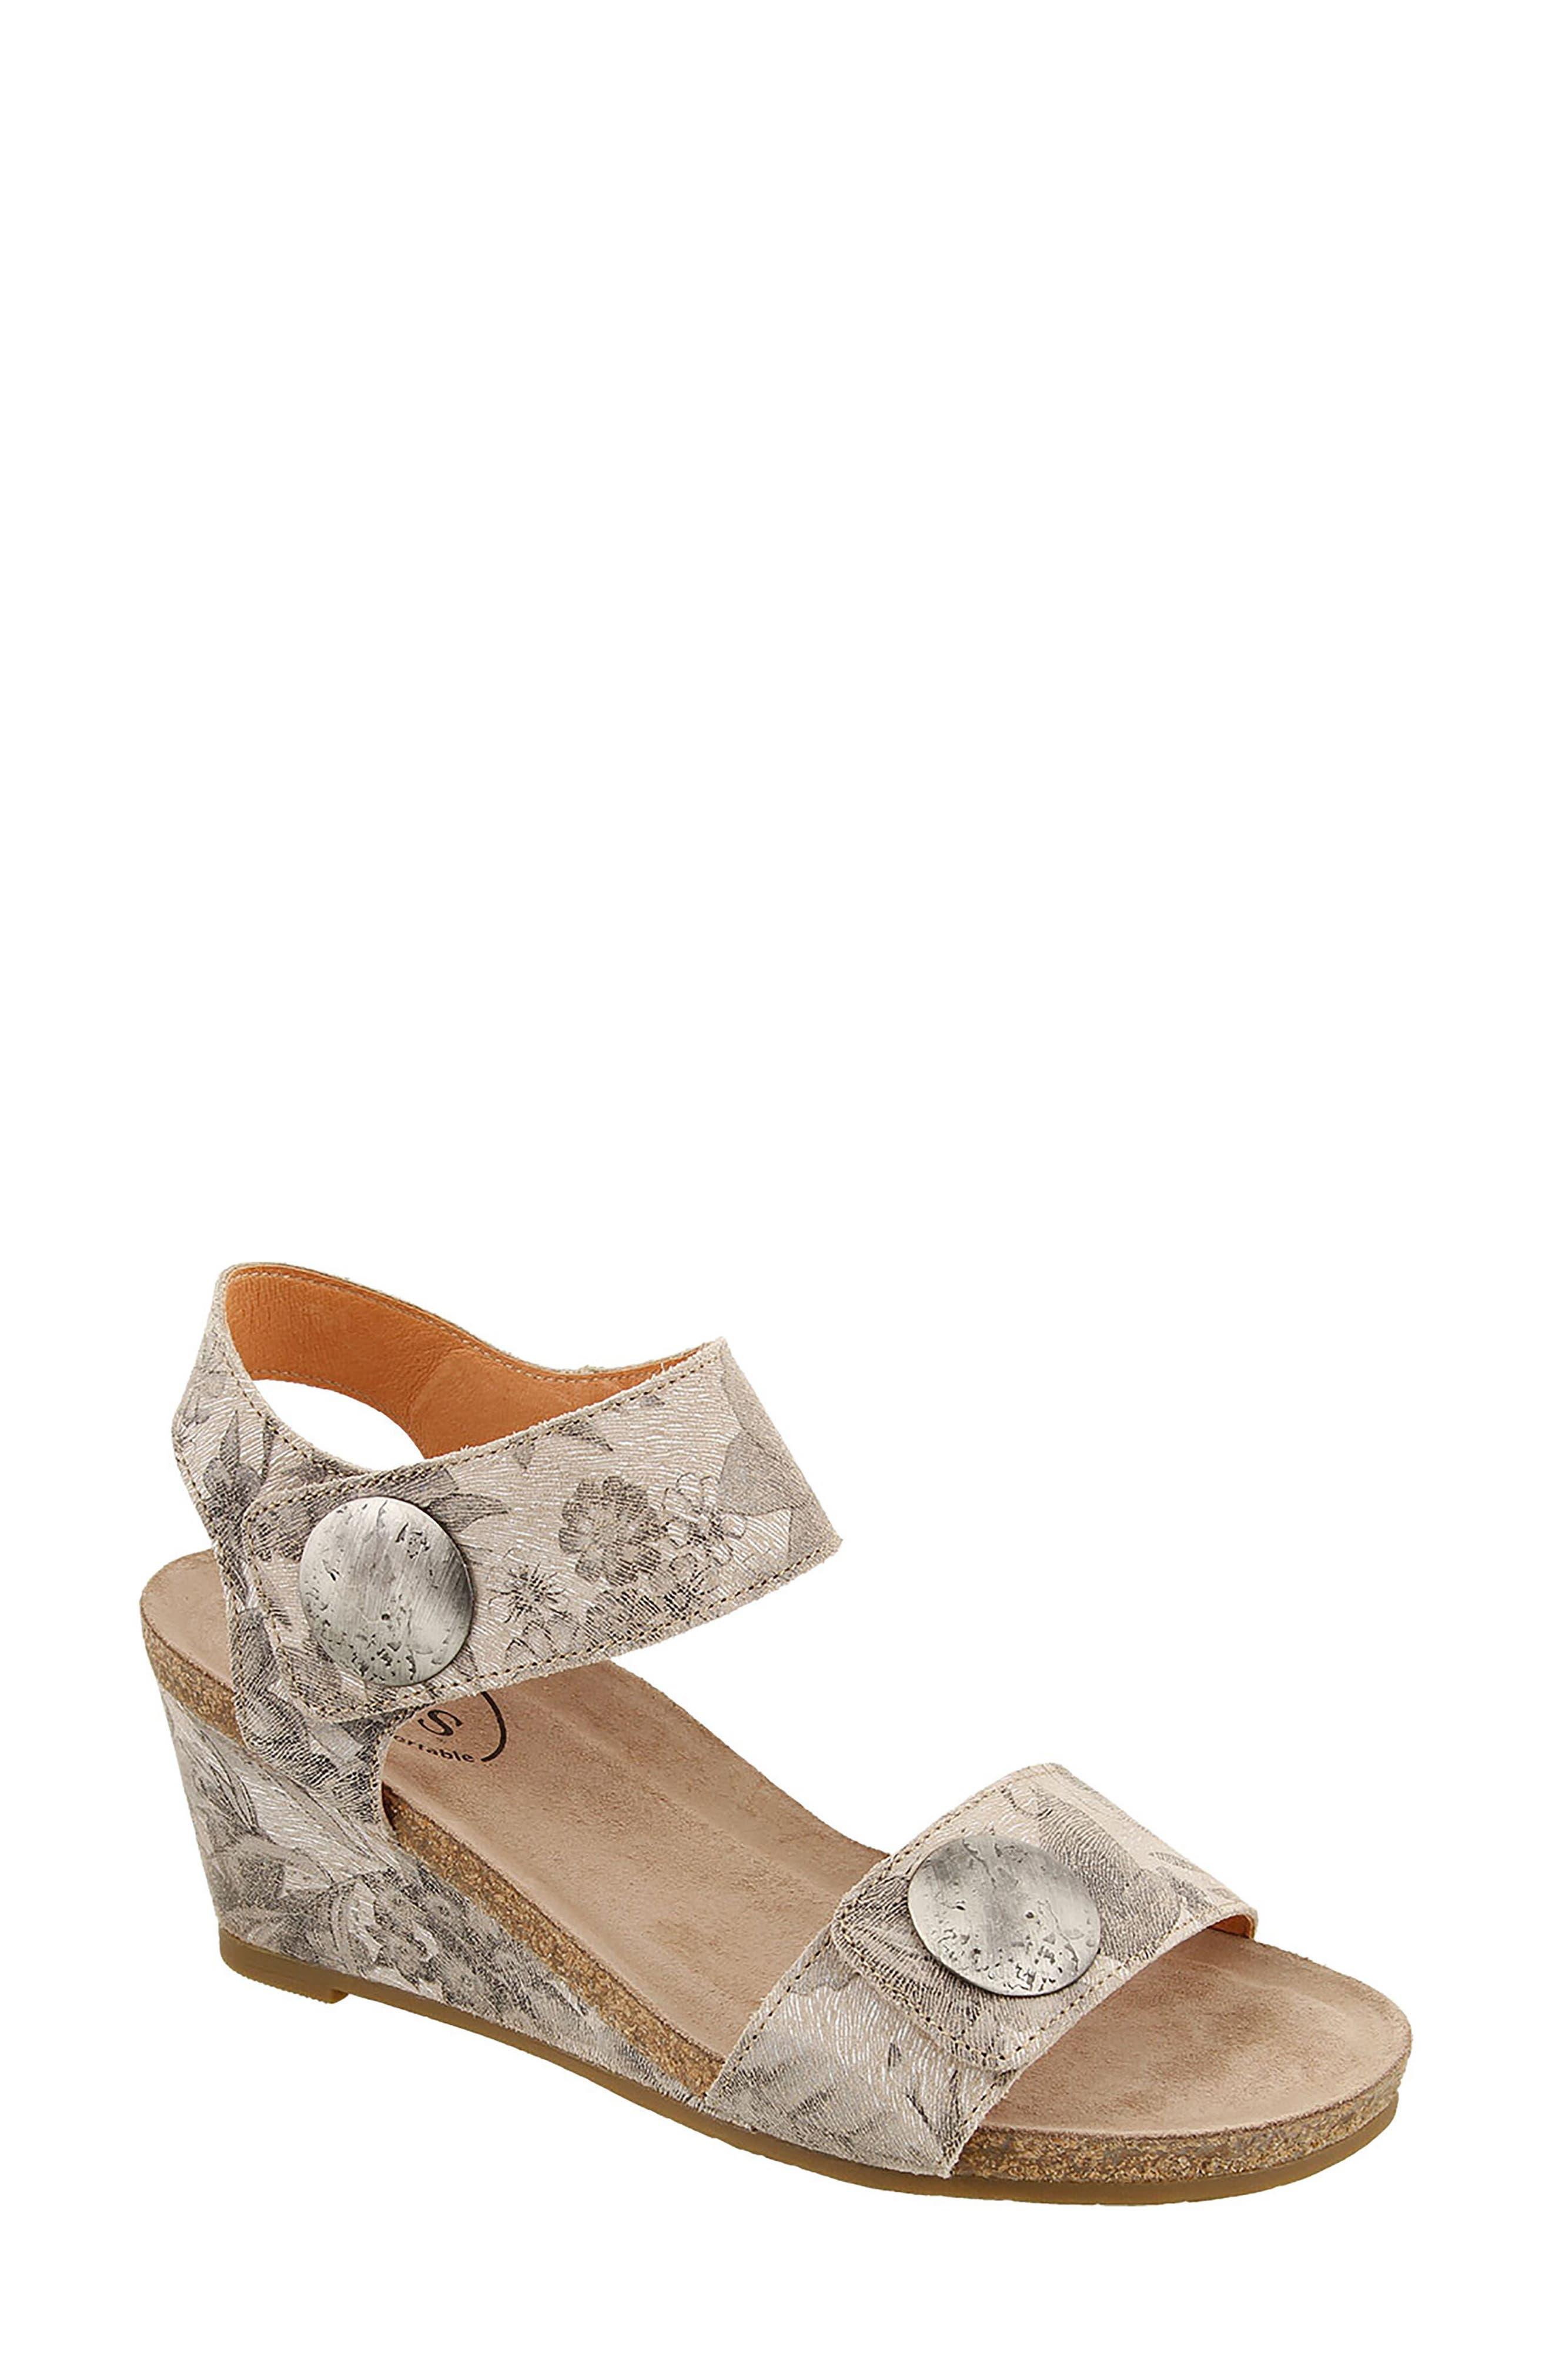 'Carousel 2' Wedge Sandal,                         Main,                         color, 054